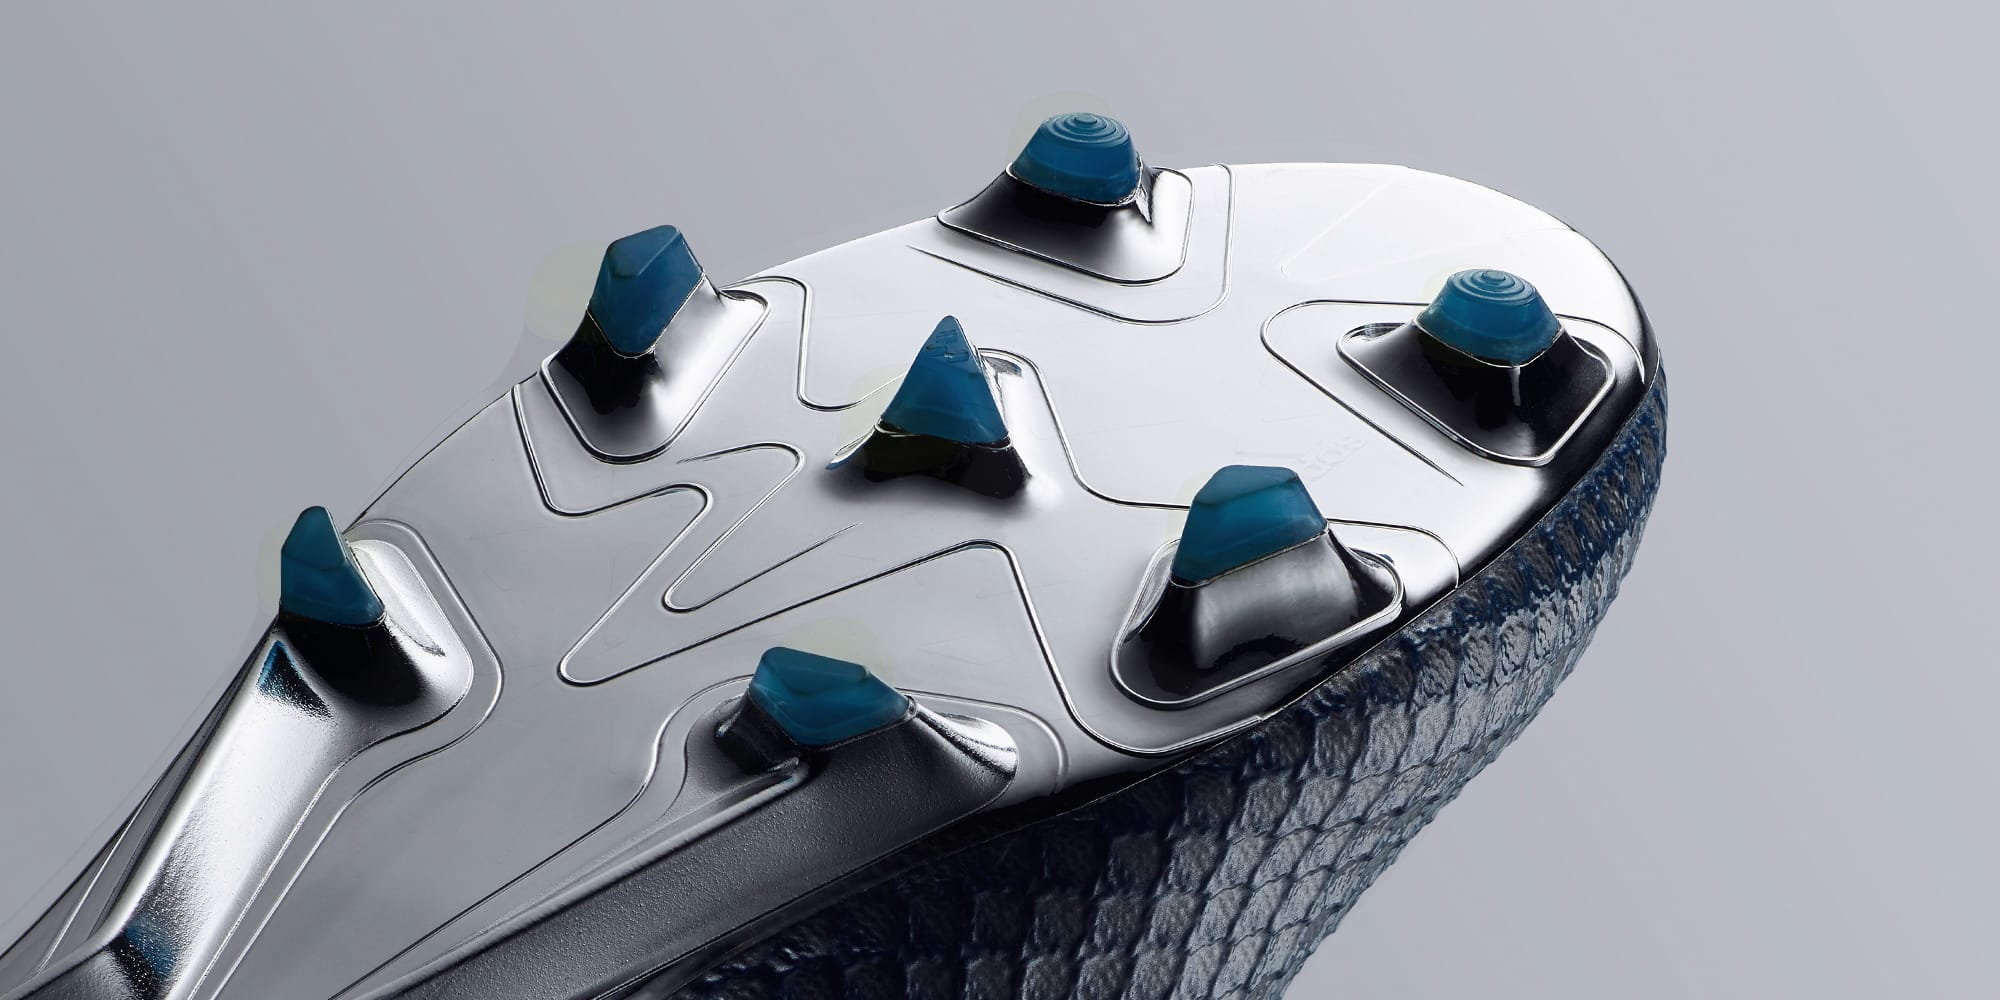 chaussure-football-adidas-Messi16-mercury-pack-copa-america-2016-6